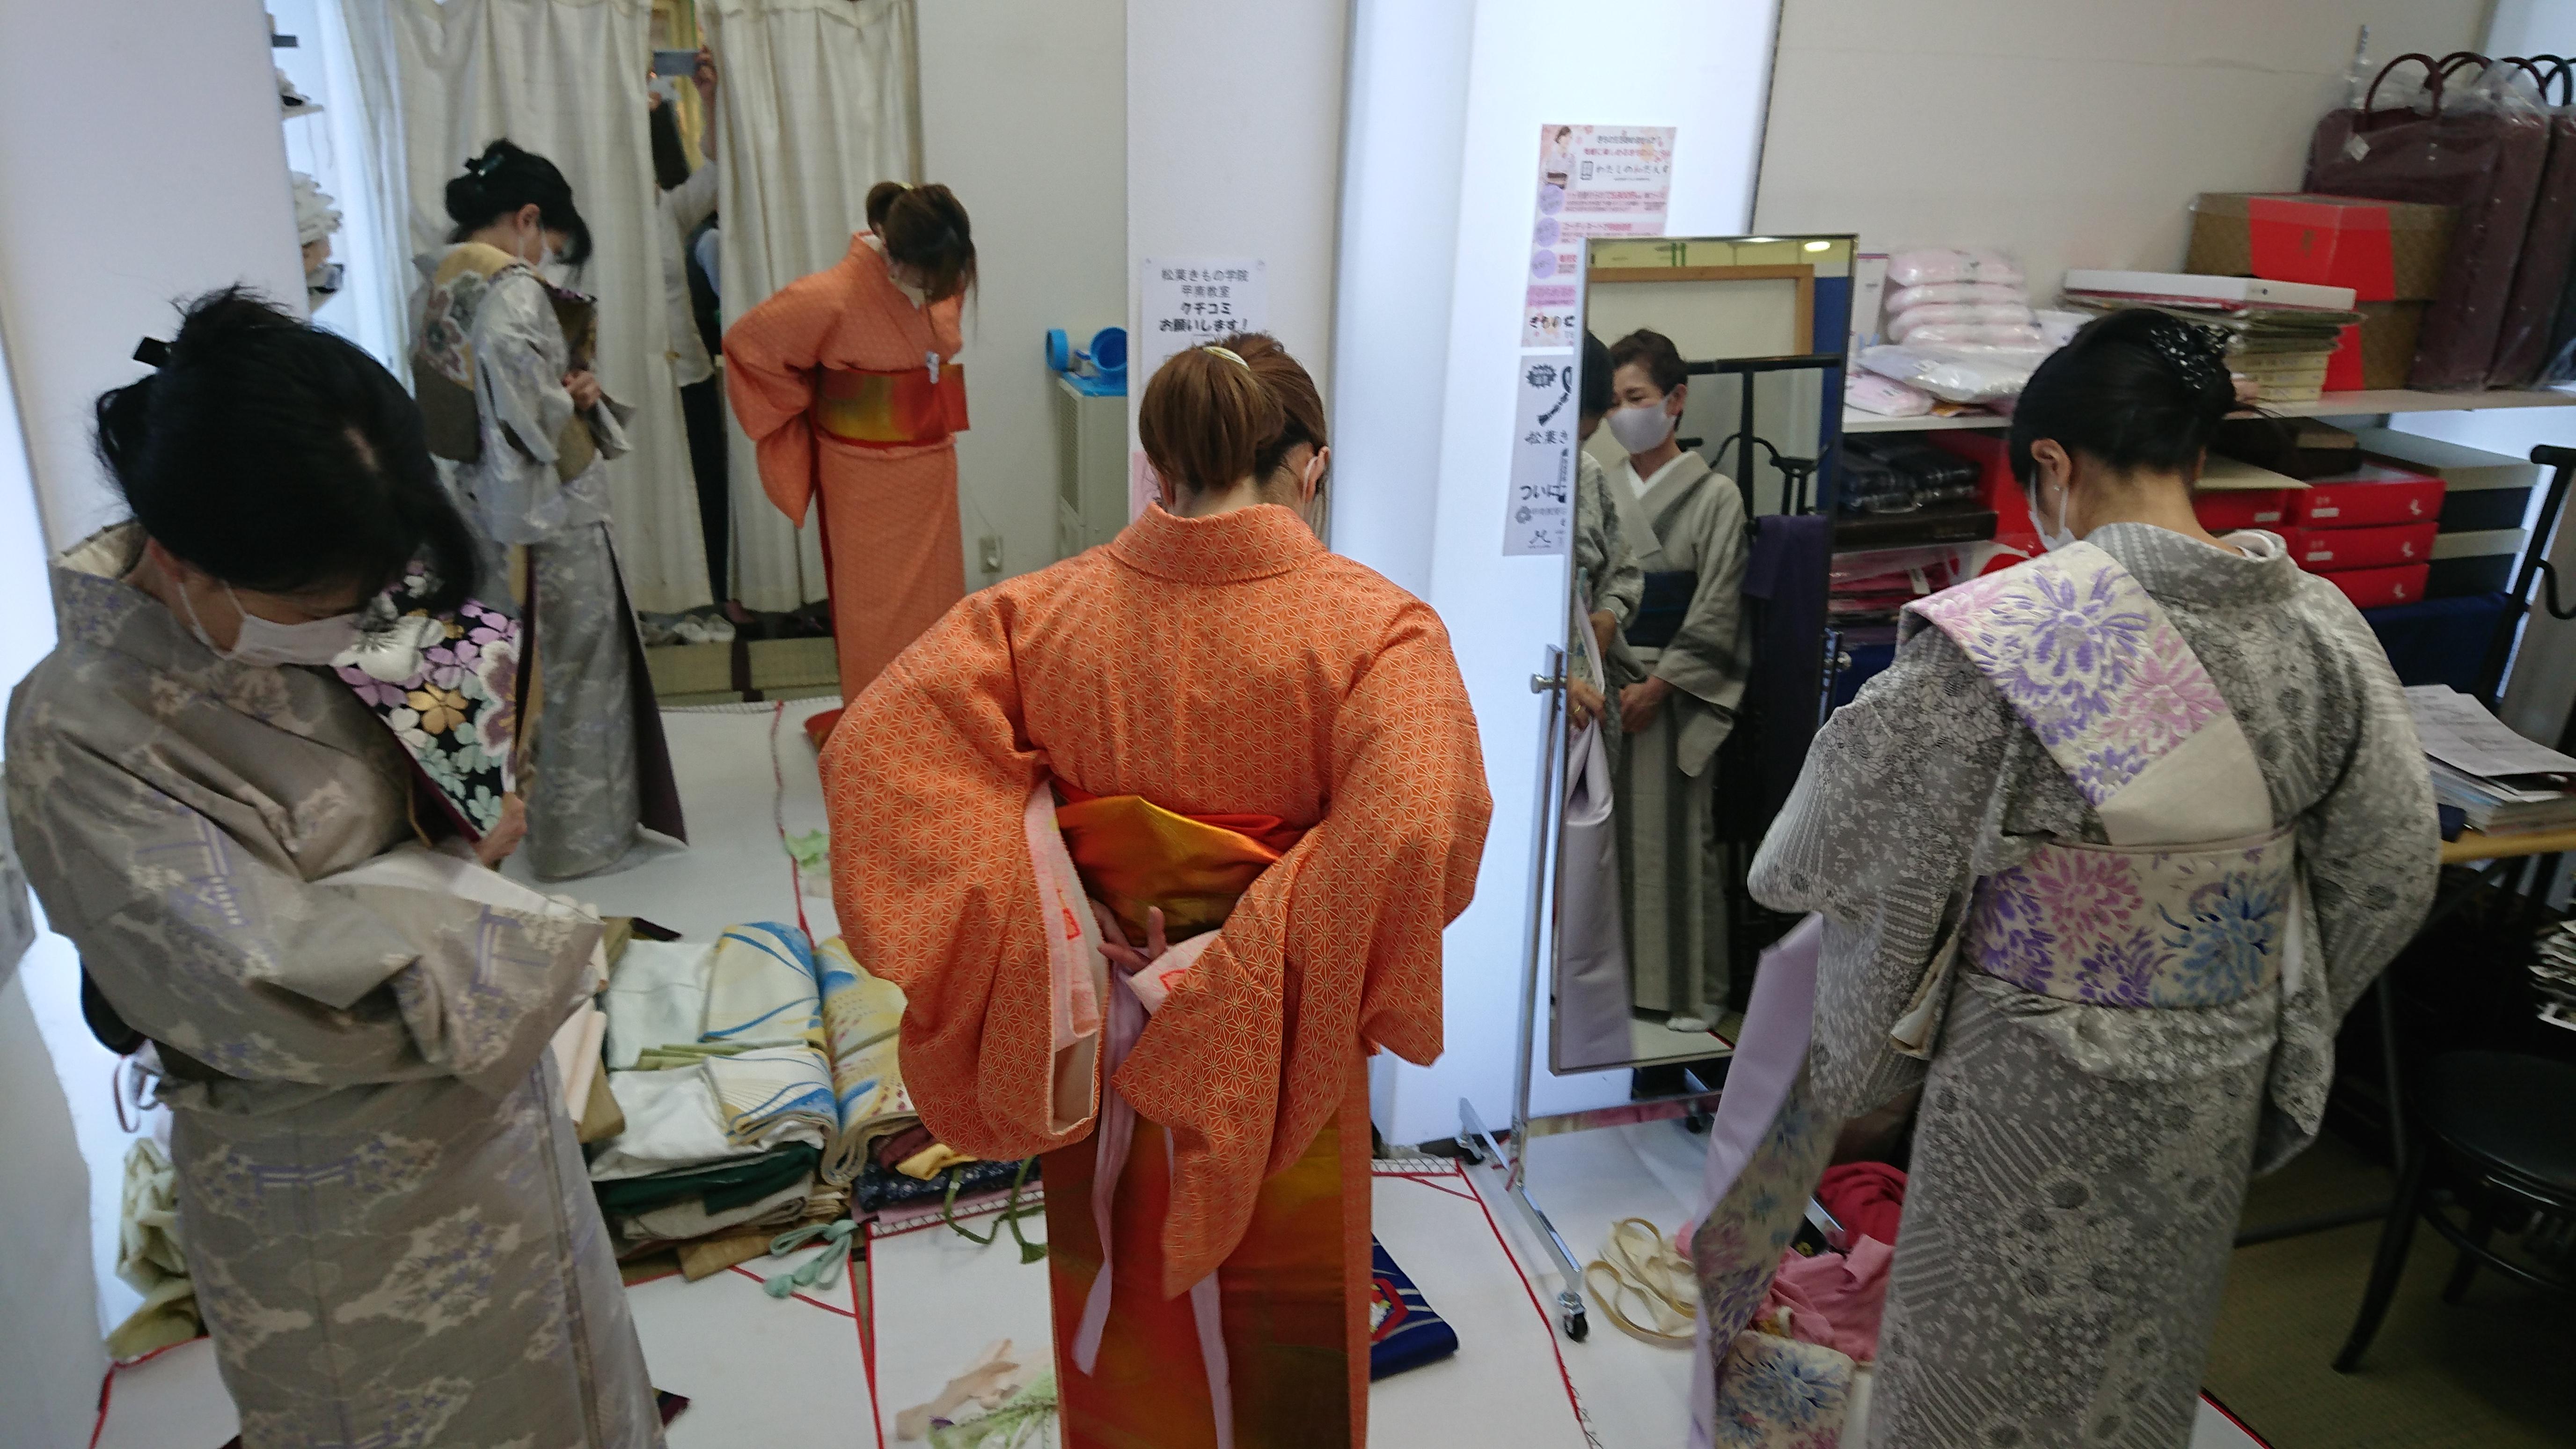 vol.26 きものの産地?-神戸市東灘区の着付け教室-